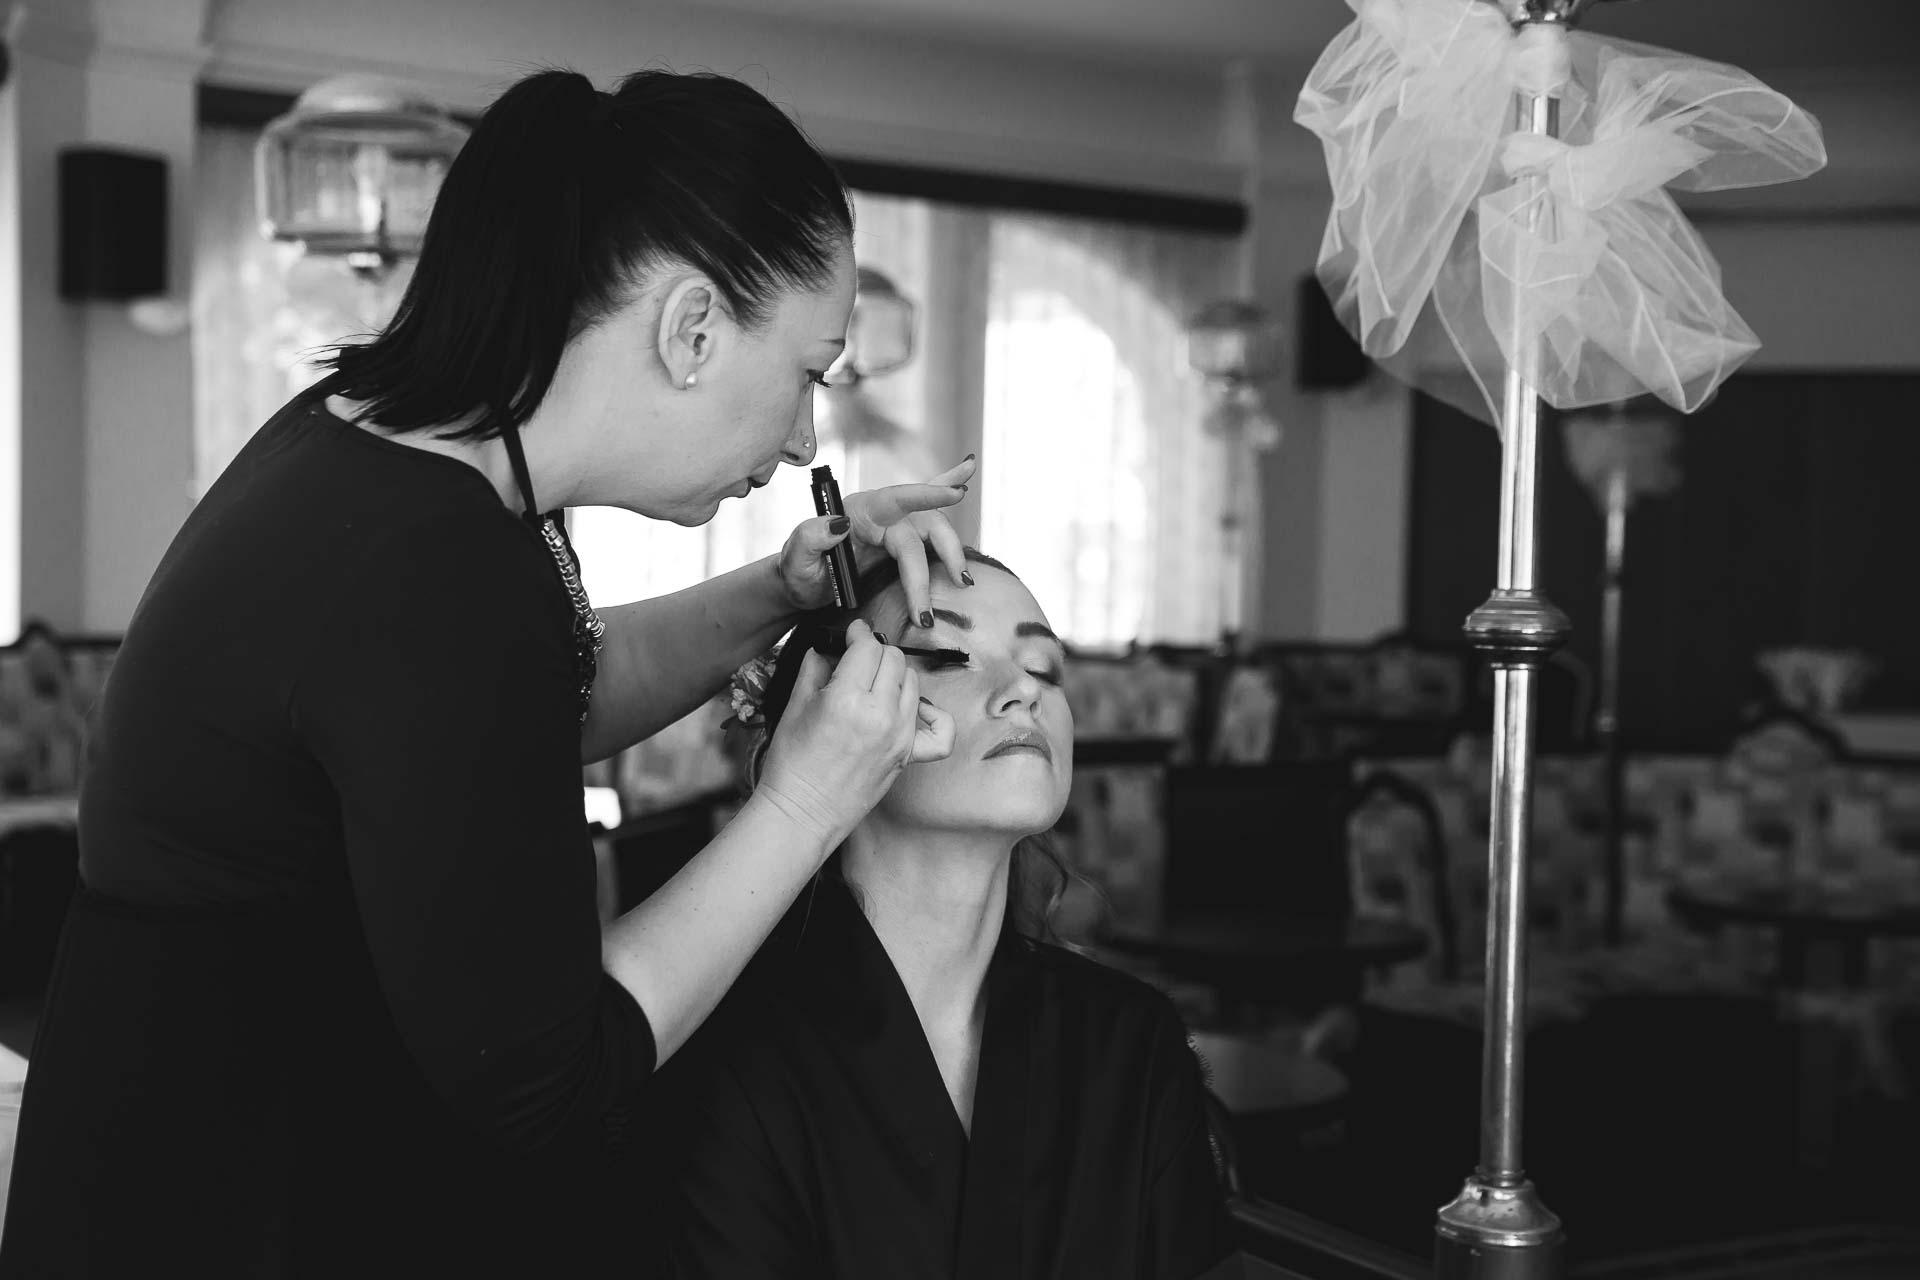 svatební-fotograf-svatebni-video-Nymburk-hotel-Ostrov-Beautyfoto-4802